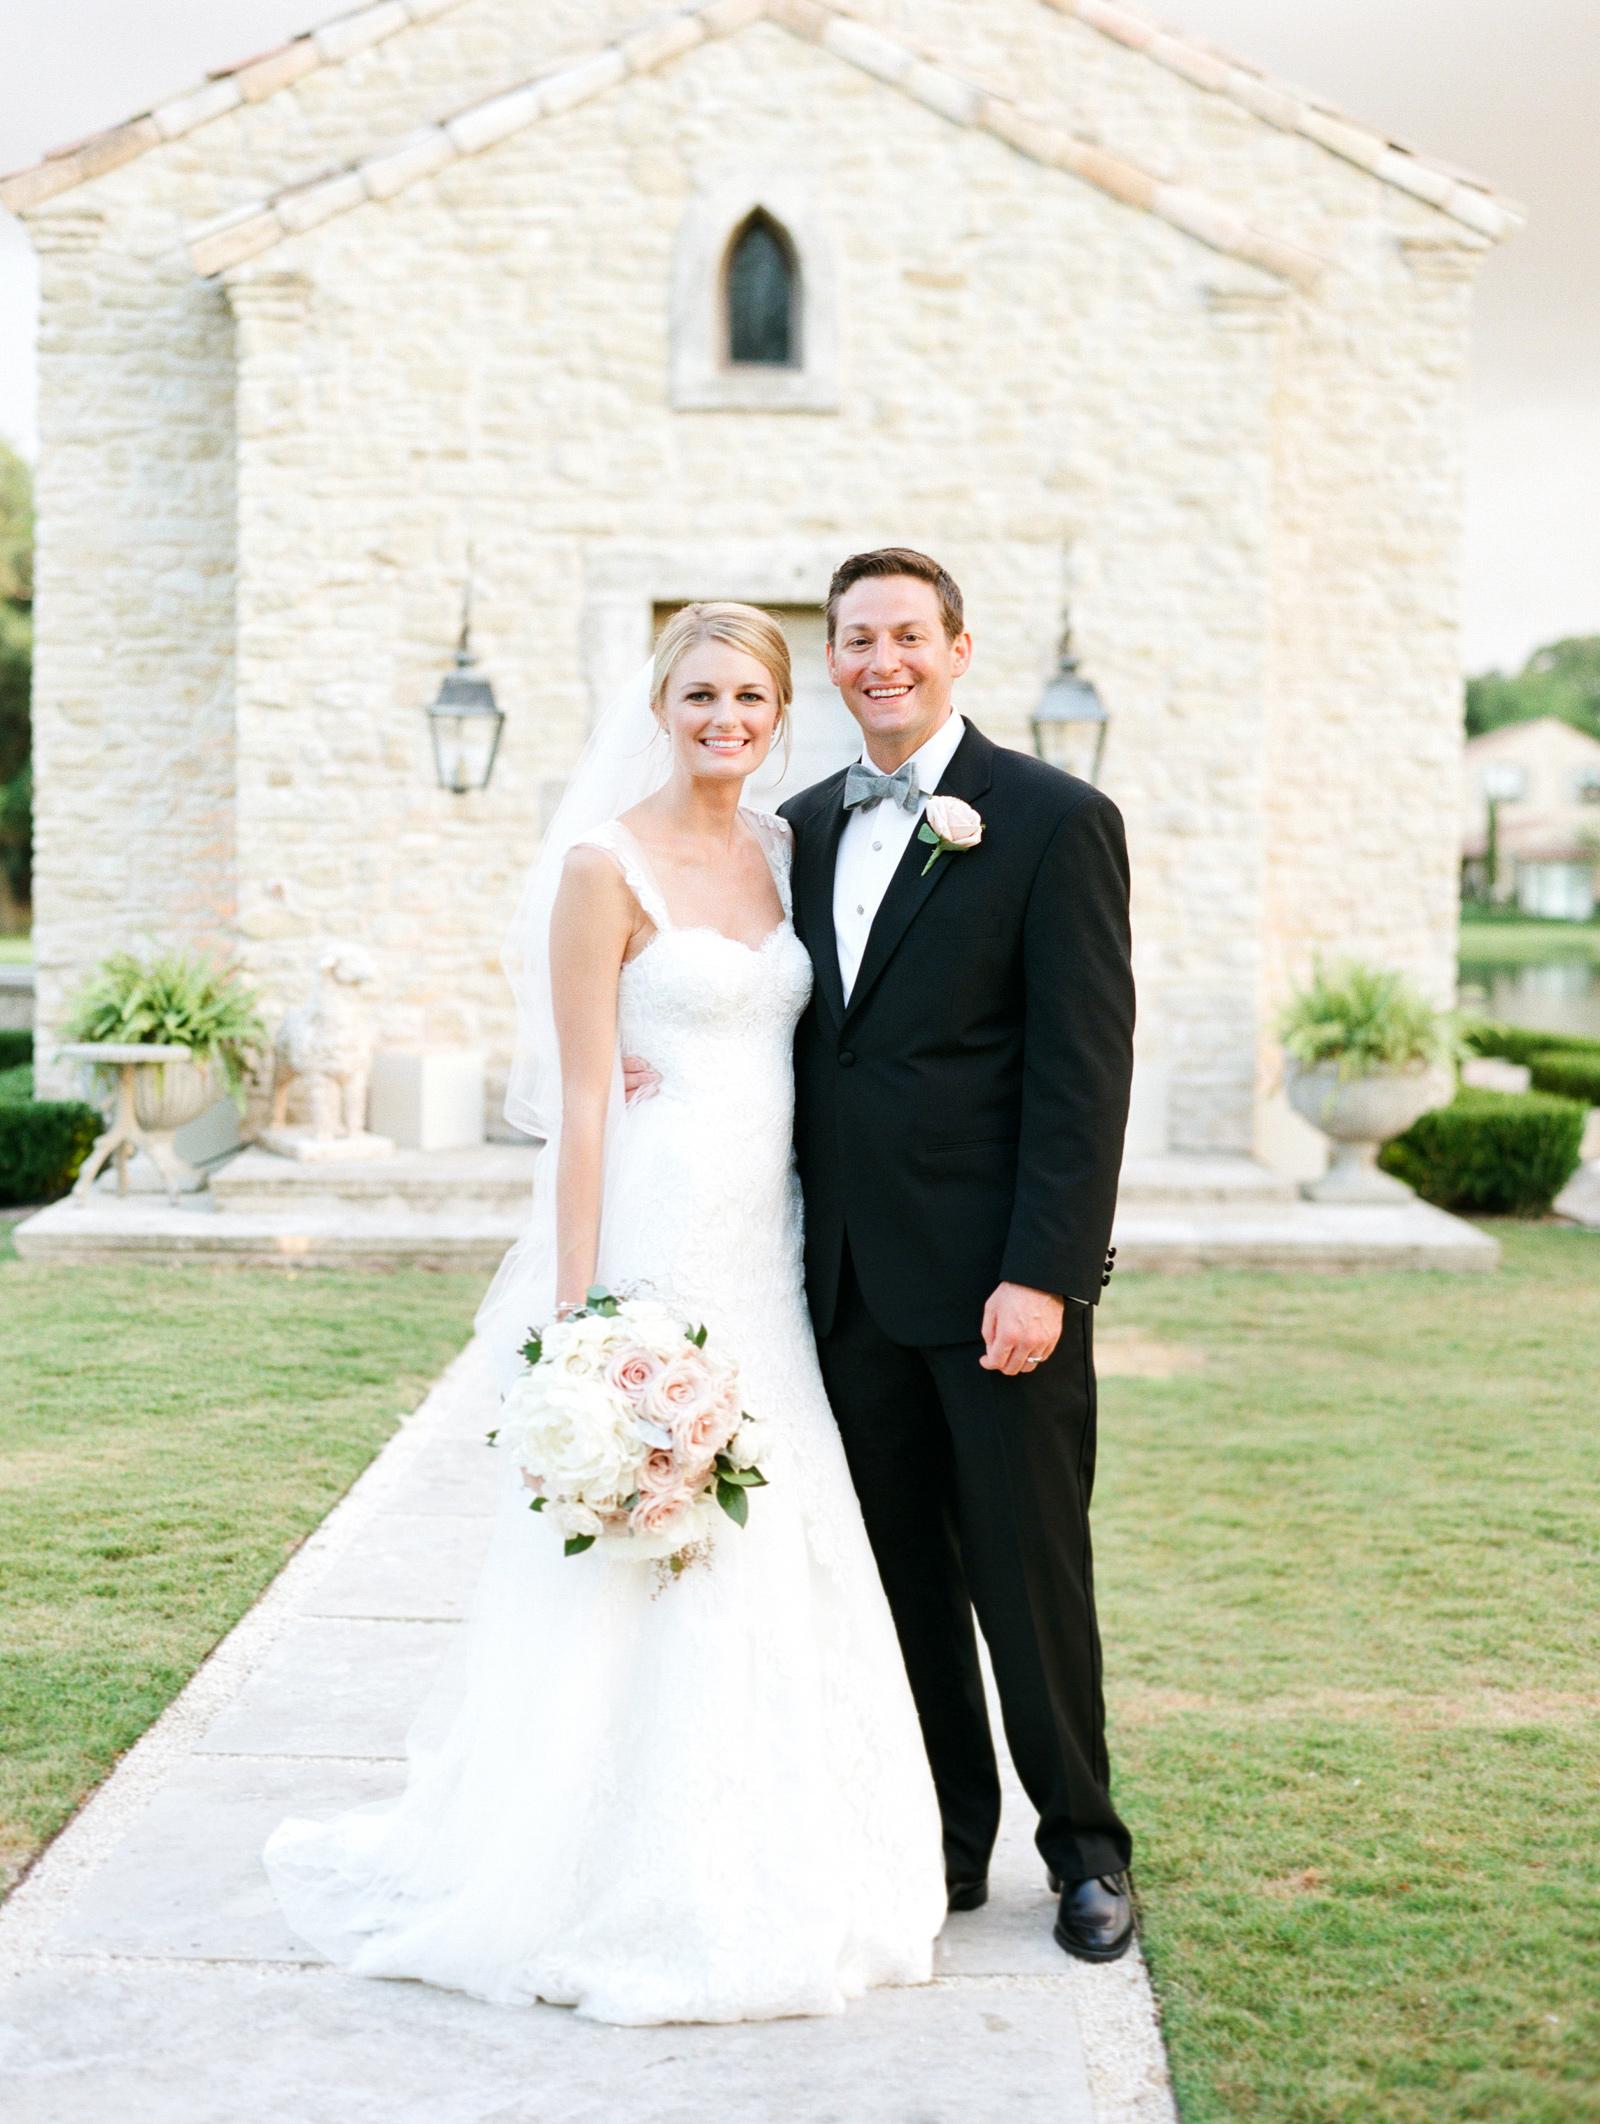 0001_0059_Houston_Oaks_Country_Club_Wedding_Brock.JPG